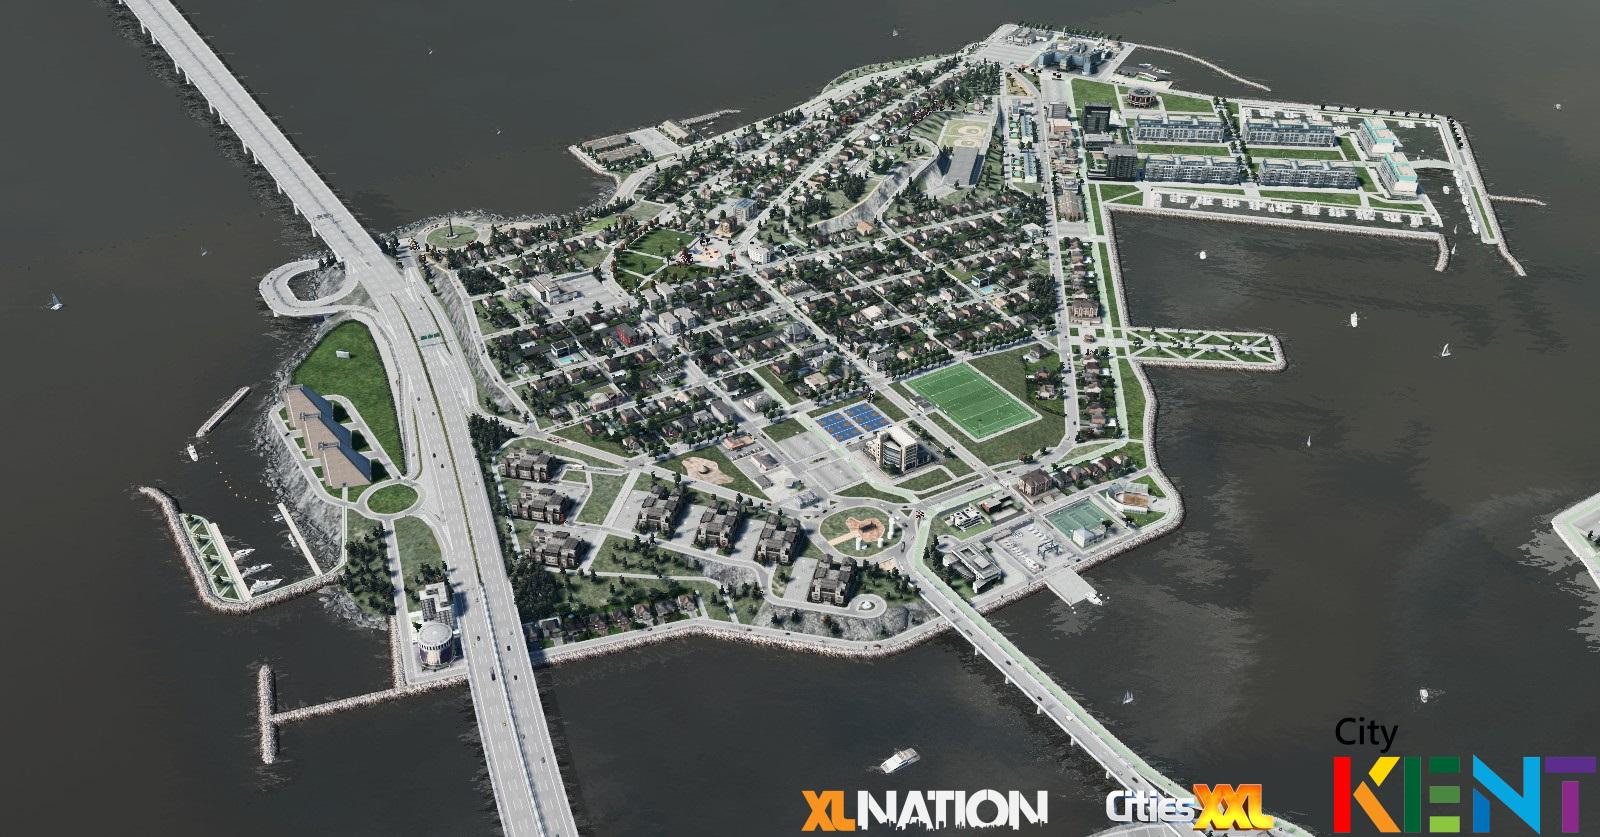 Petty Island_KENT_01_XLN_CitiesXXL.jpg